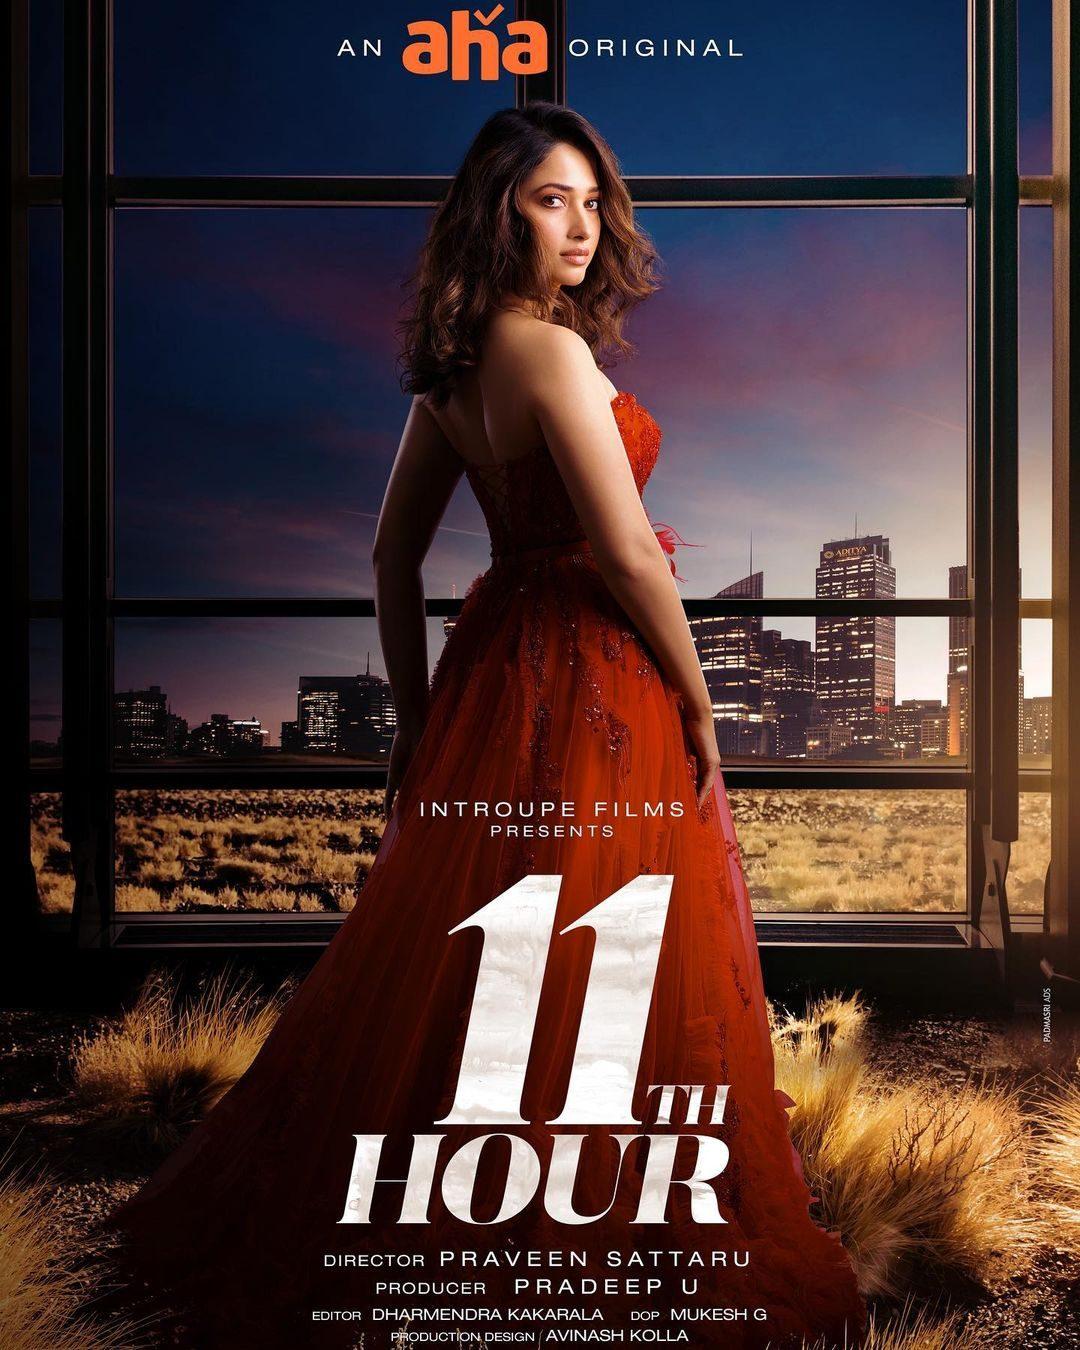 11th-Hour-on-AHA-Video---Tamannah-Teams-Up-with-Telugu-Director-Praveen-Sattaru.-